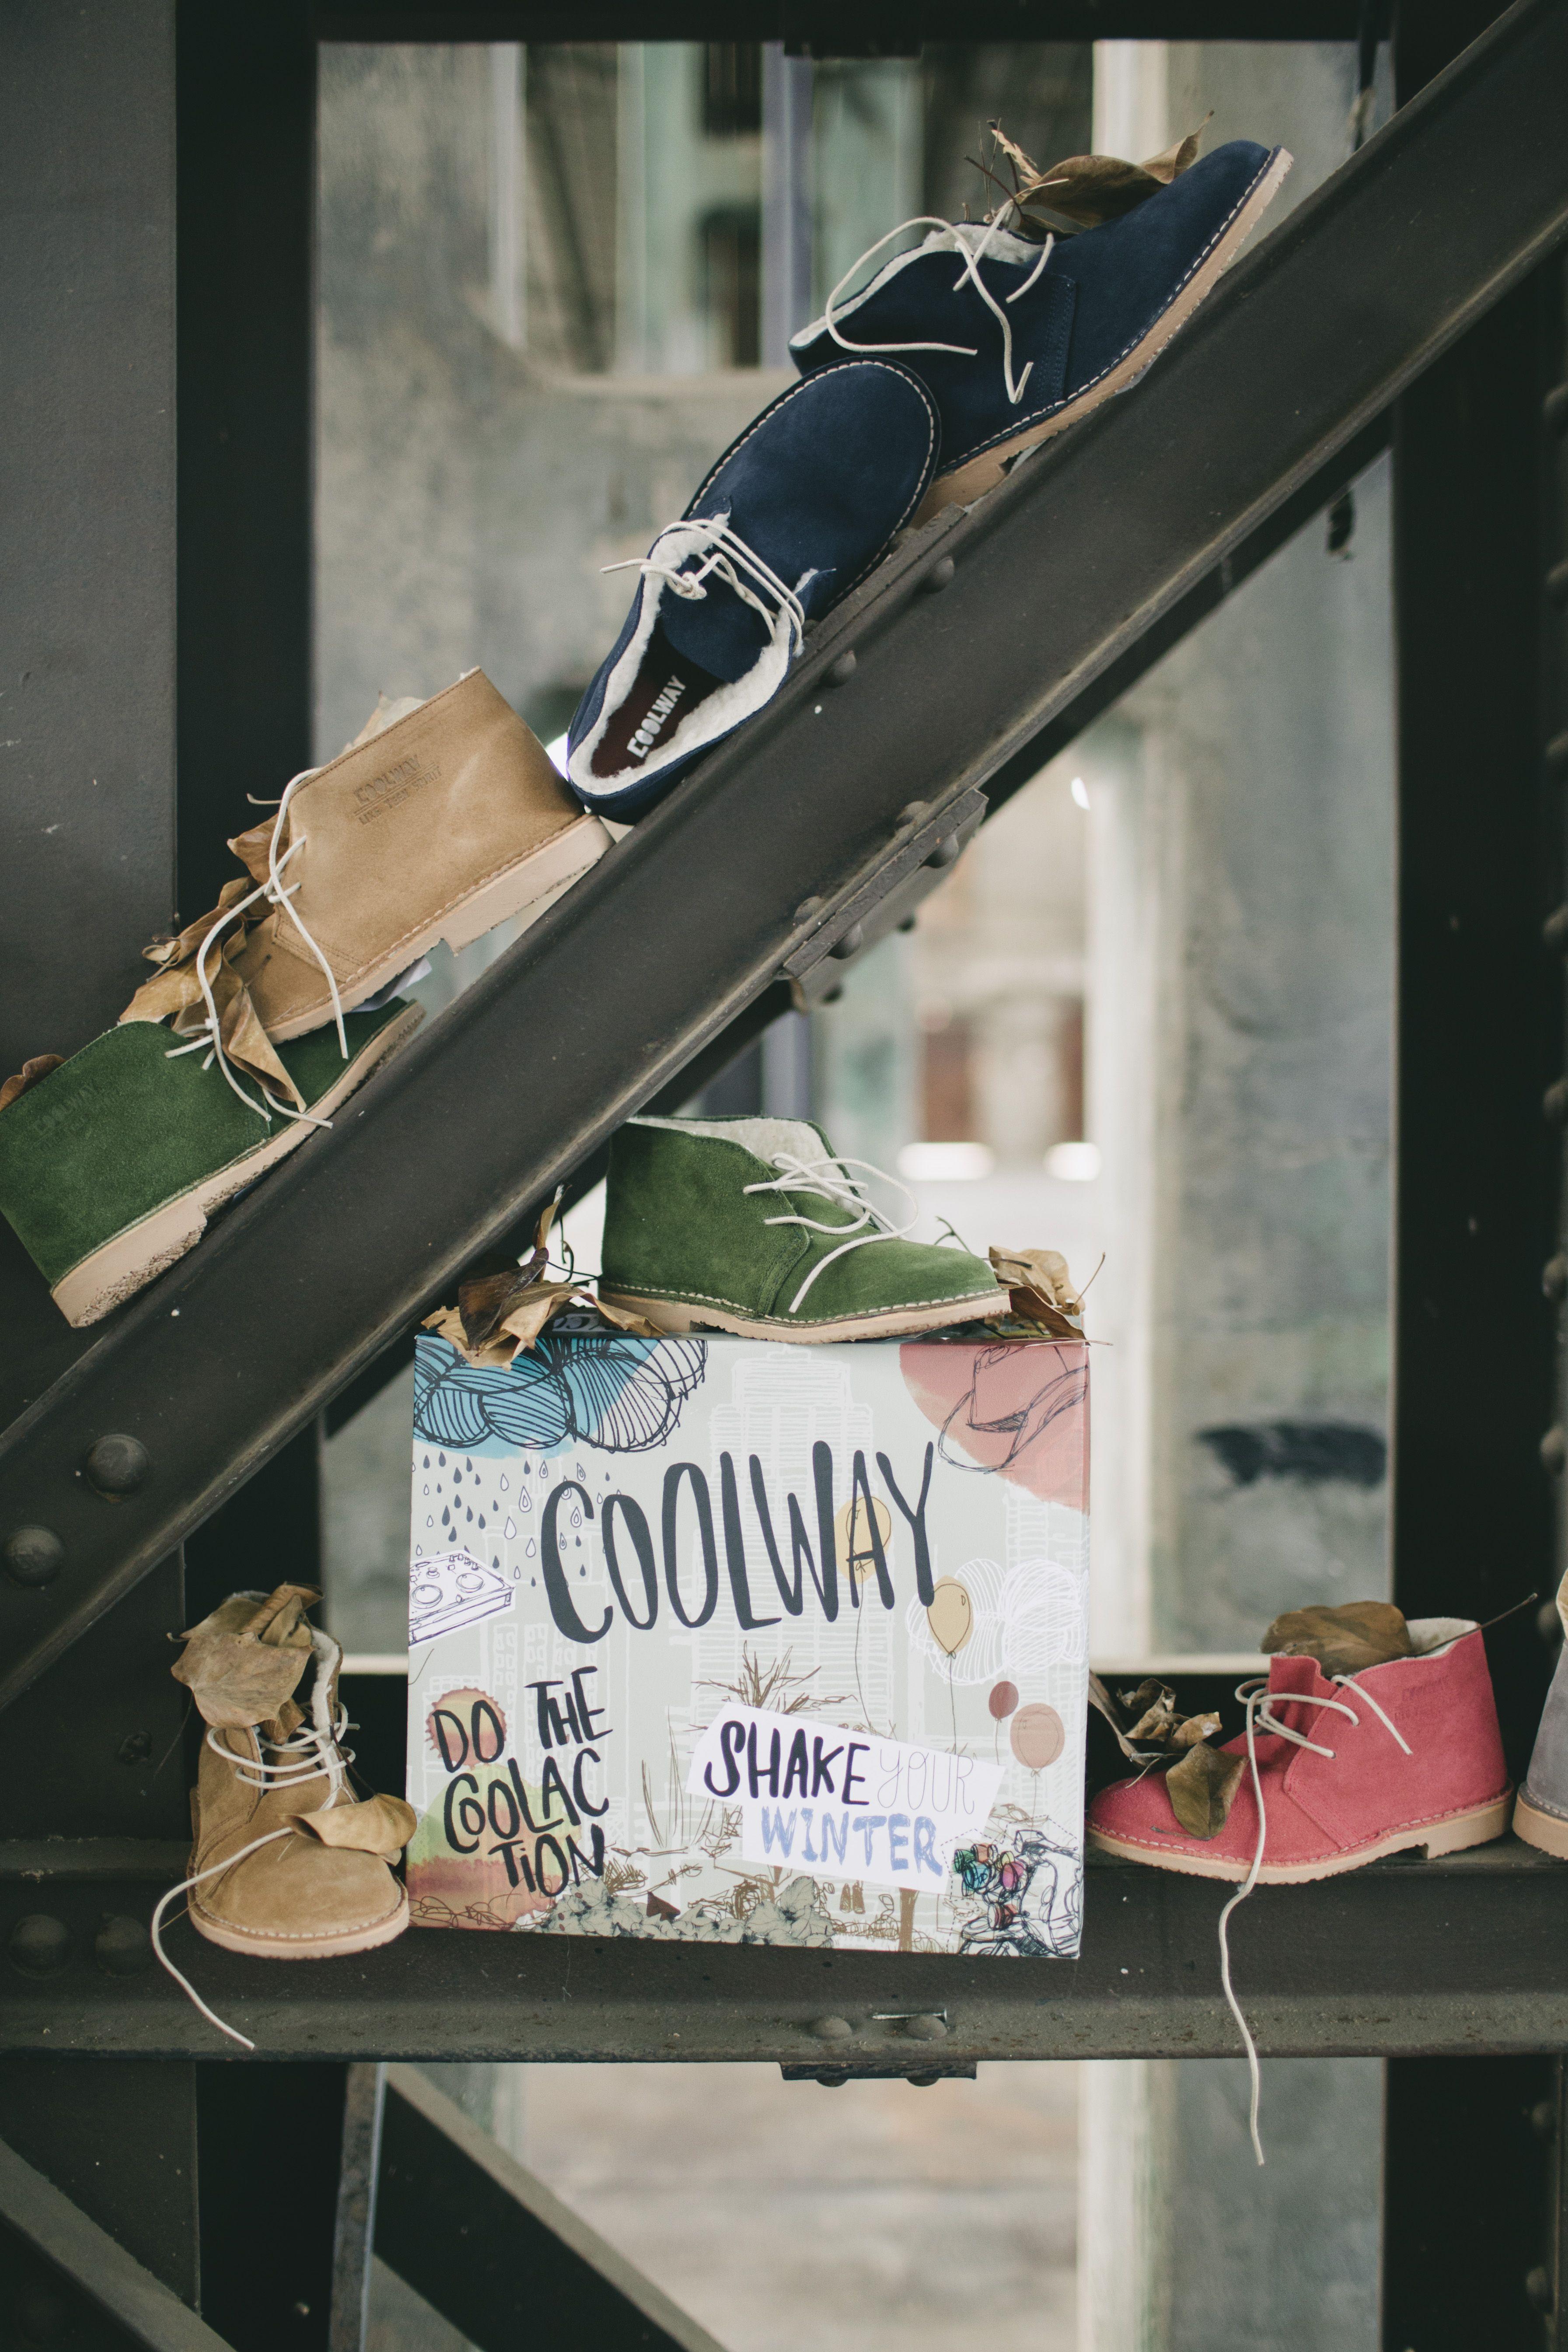 "Coolway. Shake your winter. Concepto para la campaña de Otoño invierno 2012 dentro del concepto de marca ""Do the Coolaction"""